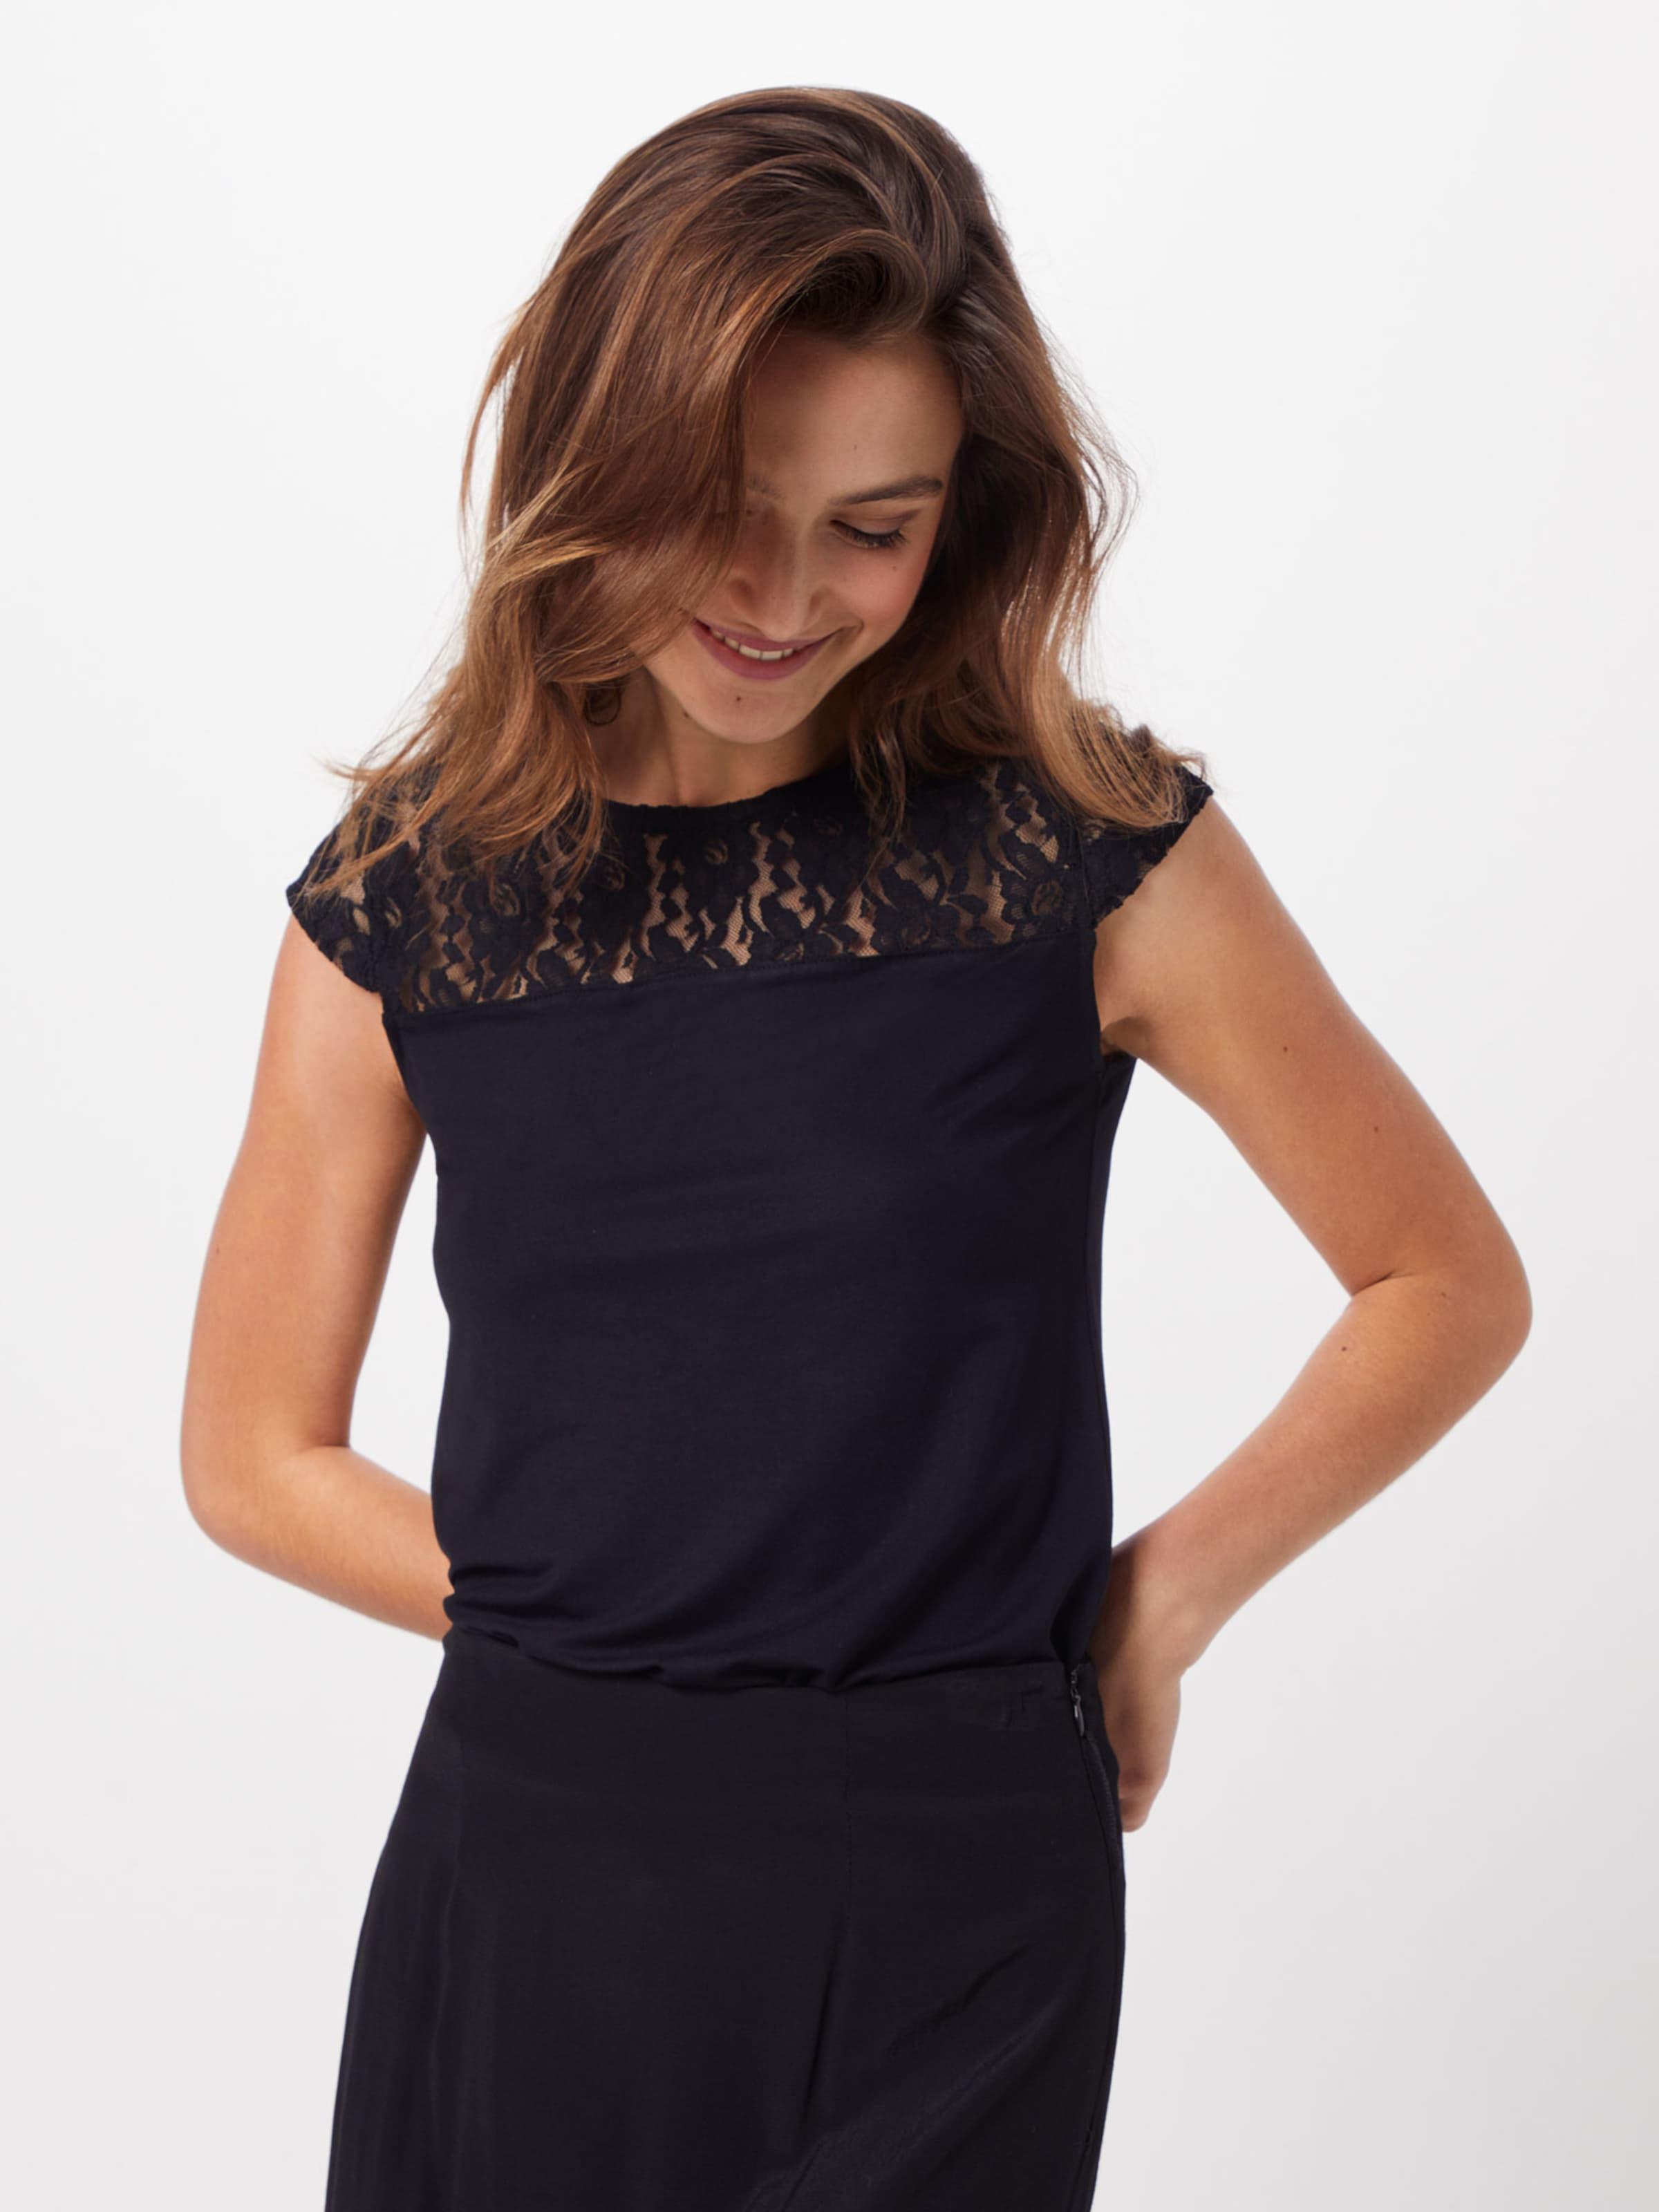 'emilie' 'emilie' Shirt Shirt Shirt Zwart Zwart In In 'emilie' uJ5FTlK1c3